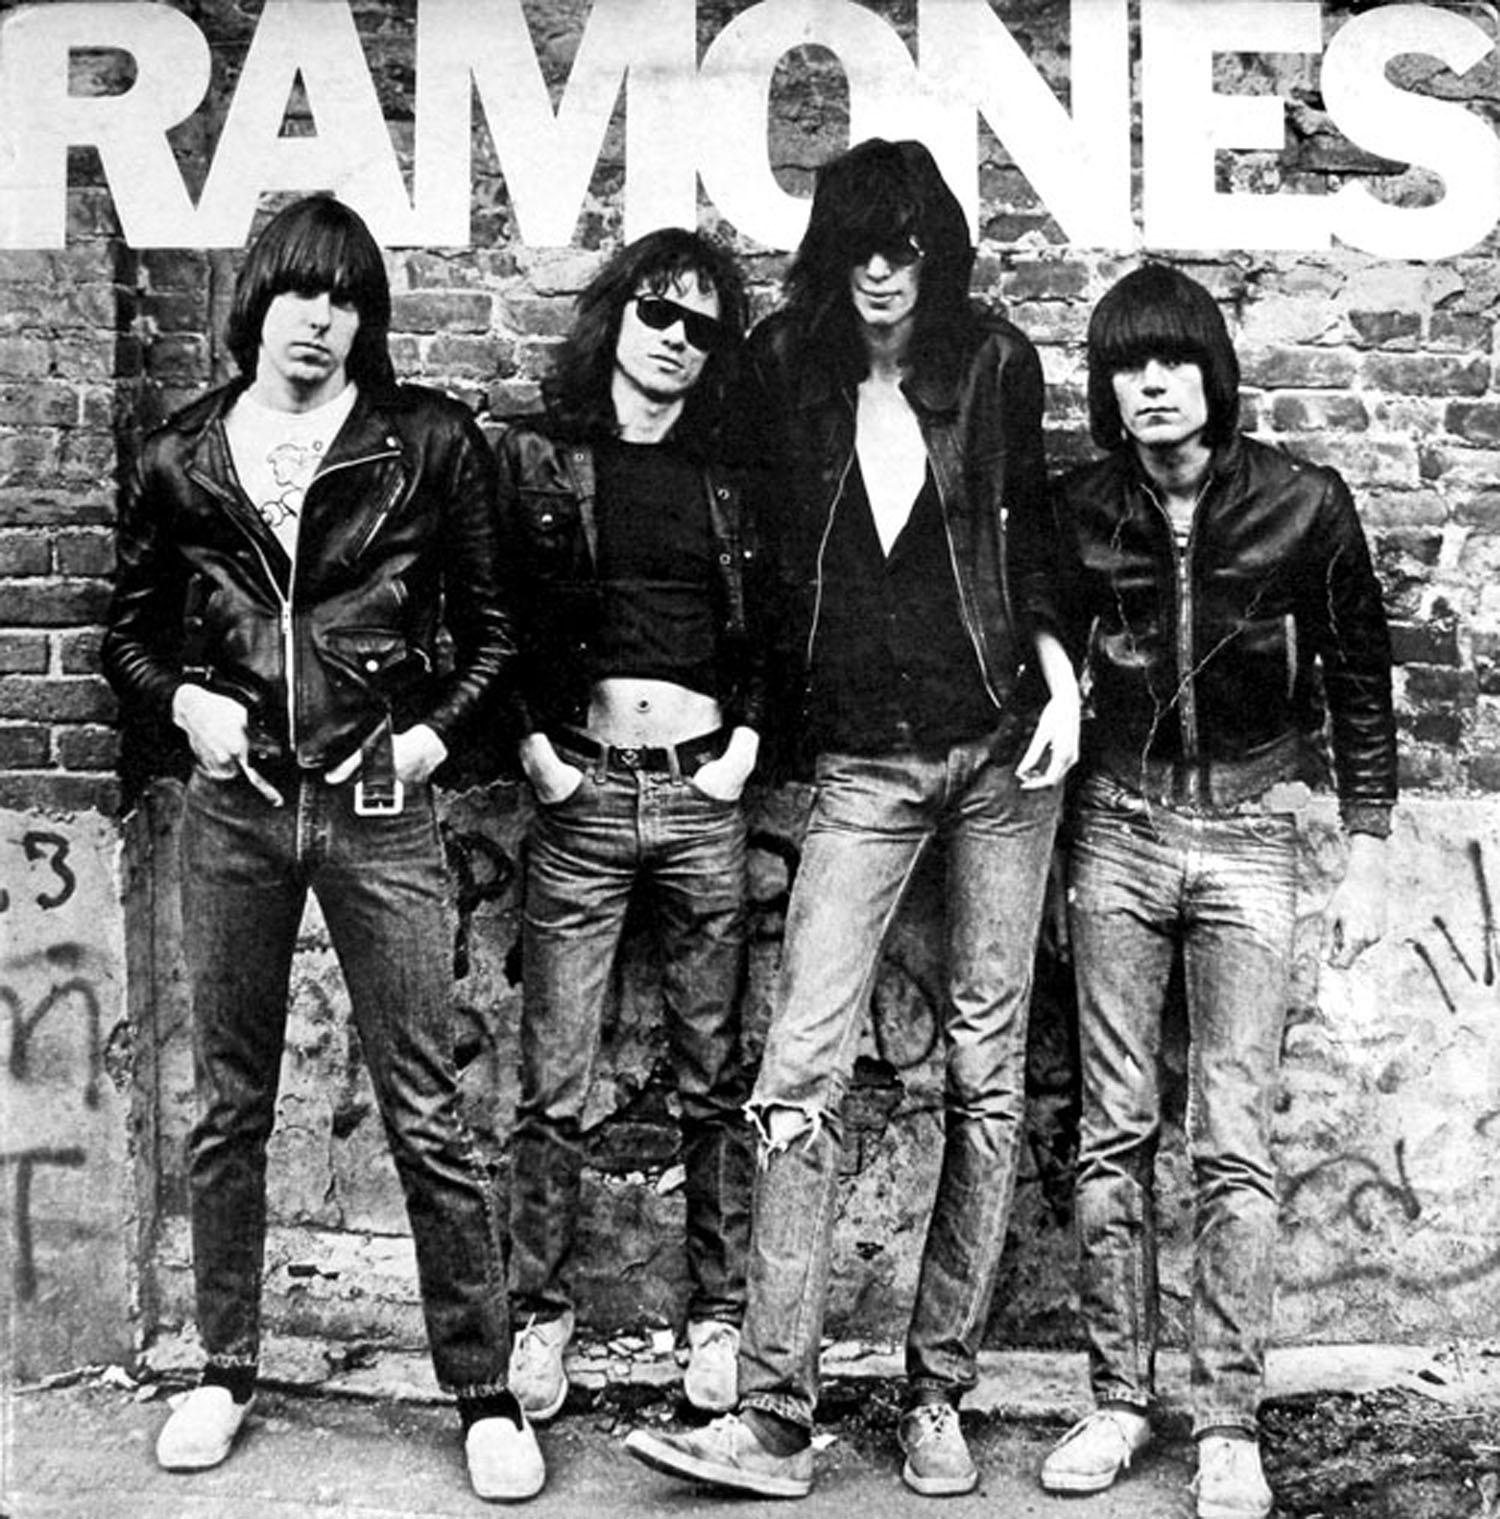 Roberta Bayley (photographer), Ramones album